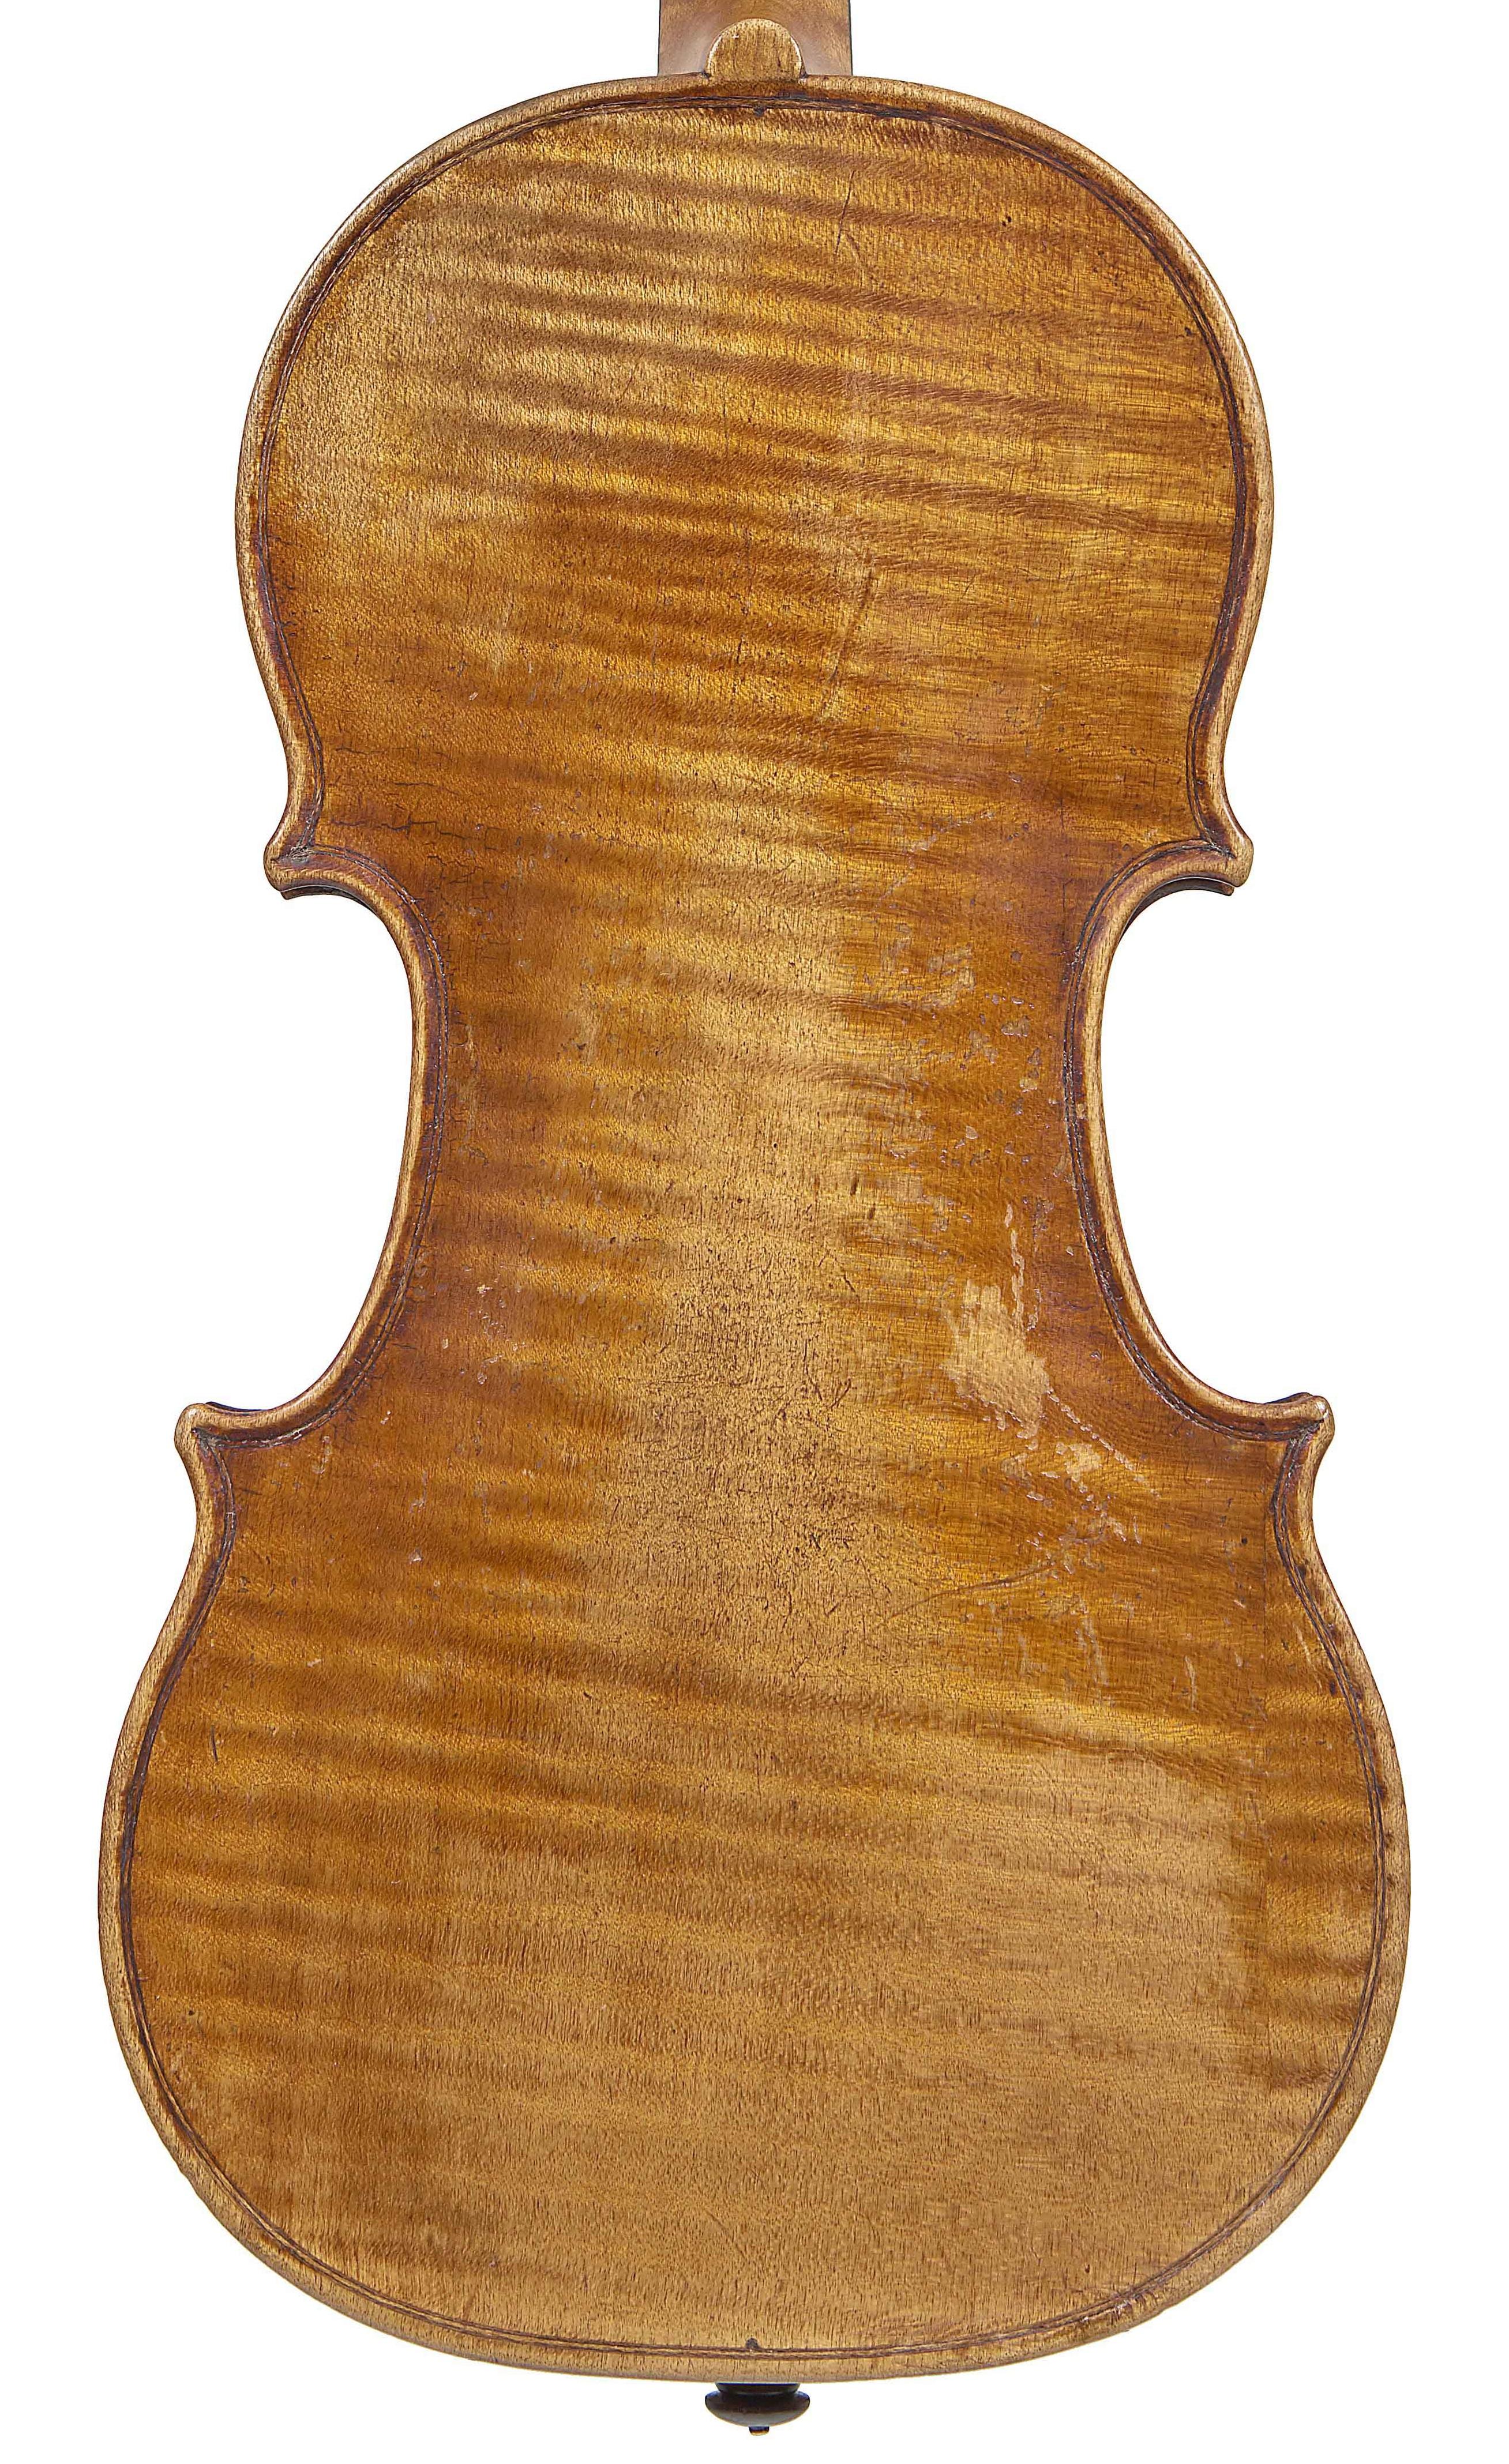 back of a 3/4 size violin by Tommaso Balestrieri, Mantua, circa 1765